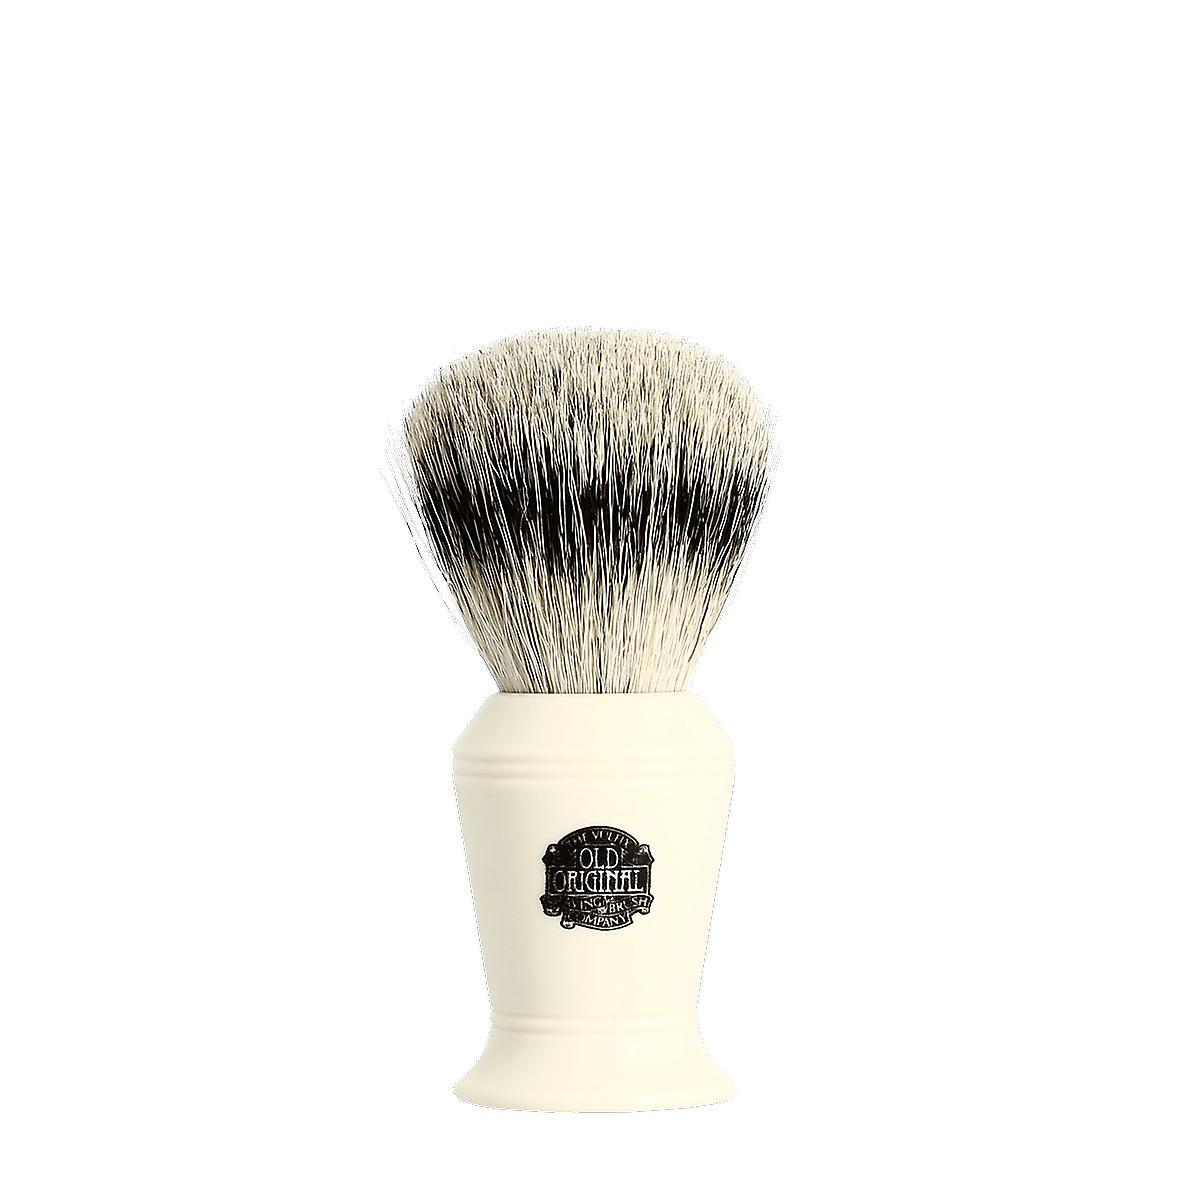 Rasage Super Blanc Vulfix 376s Brosse Blaireau 7ybvIgYf6